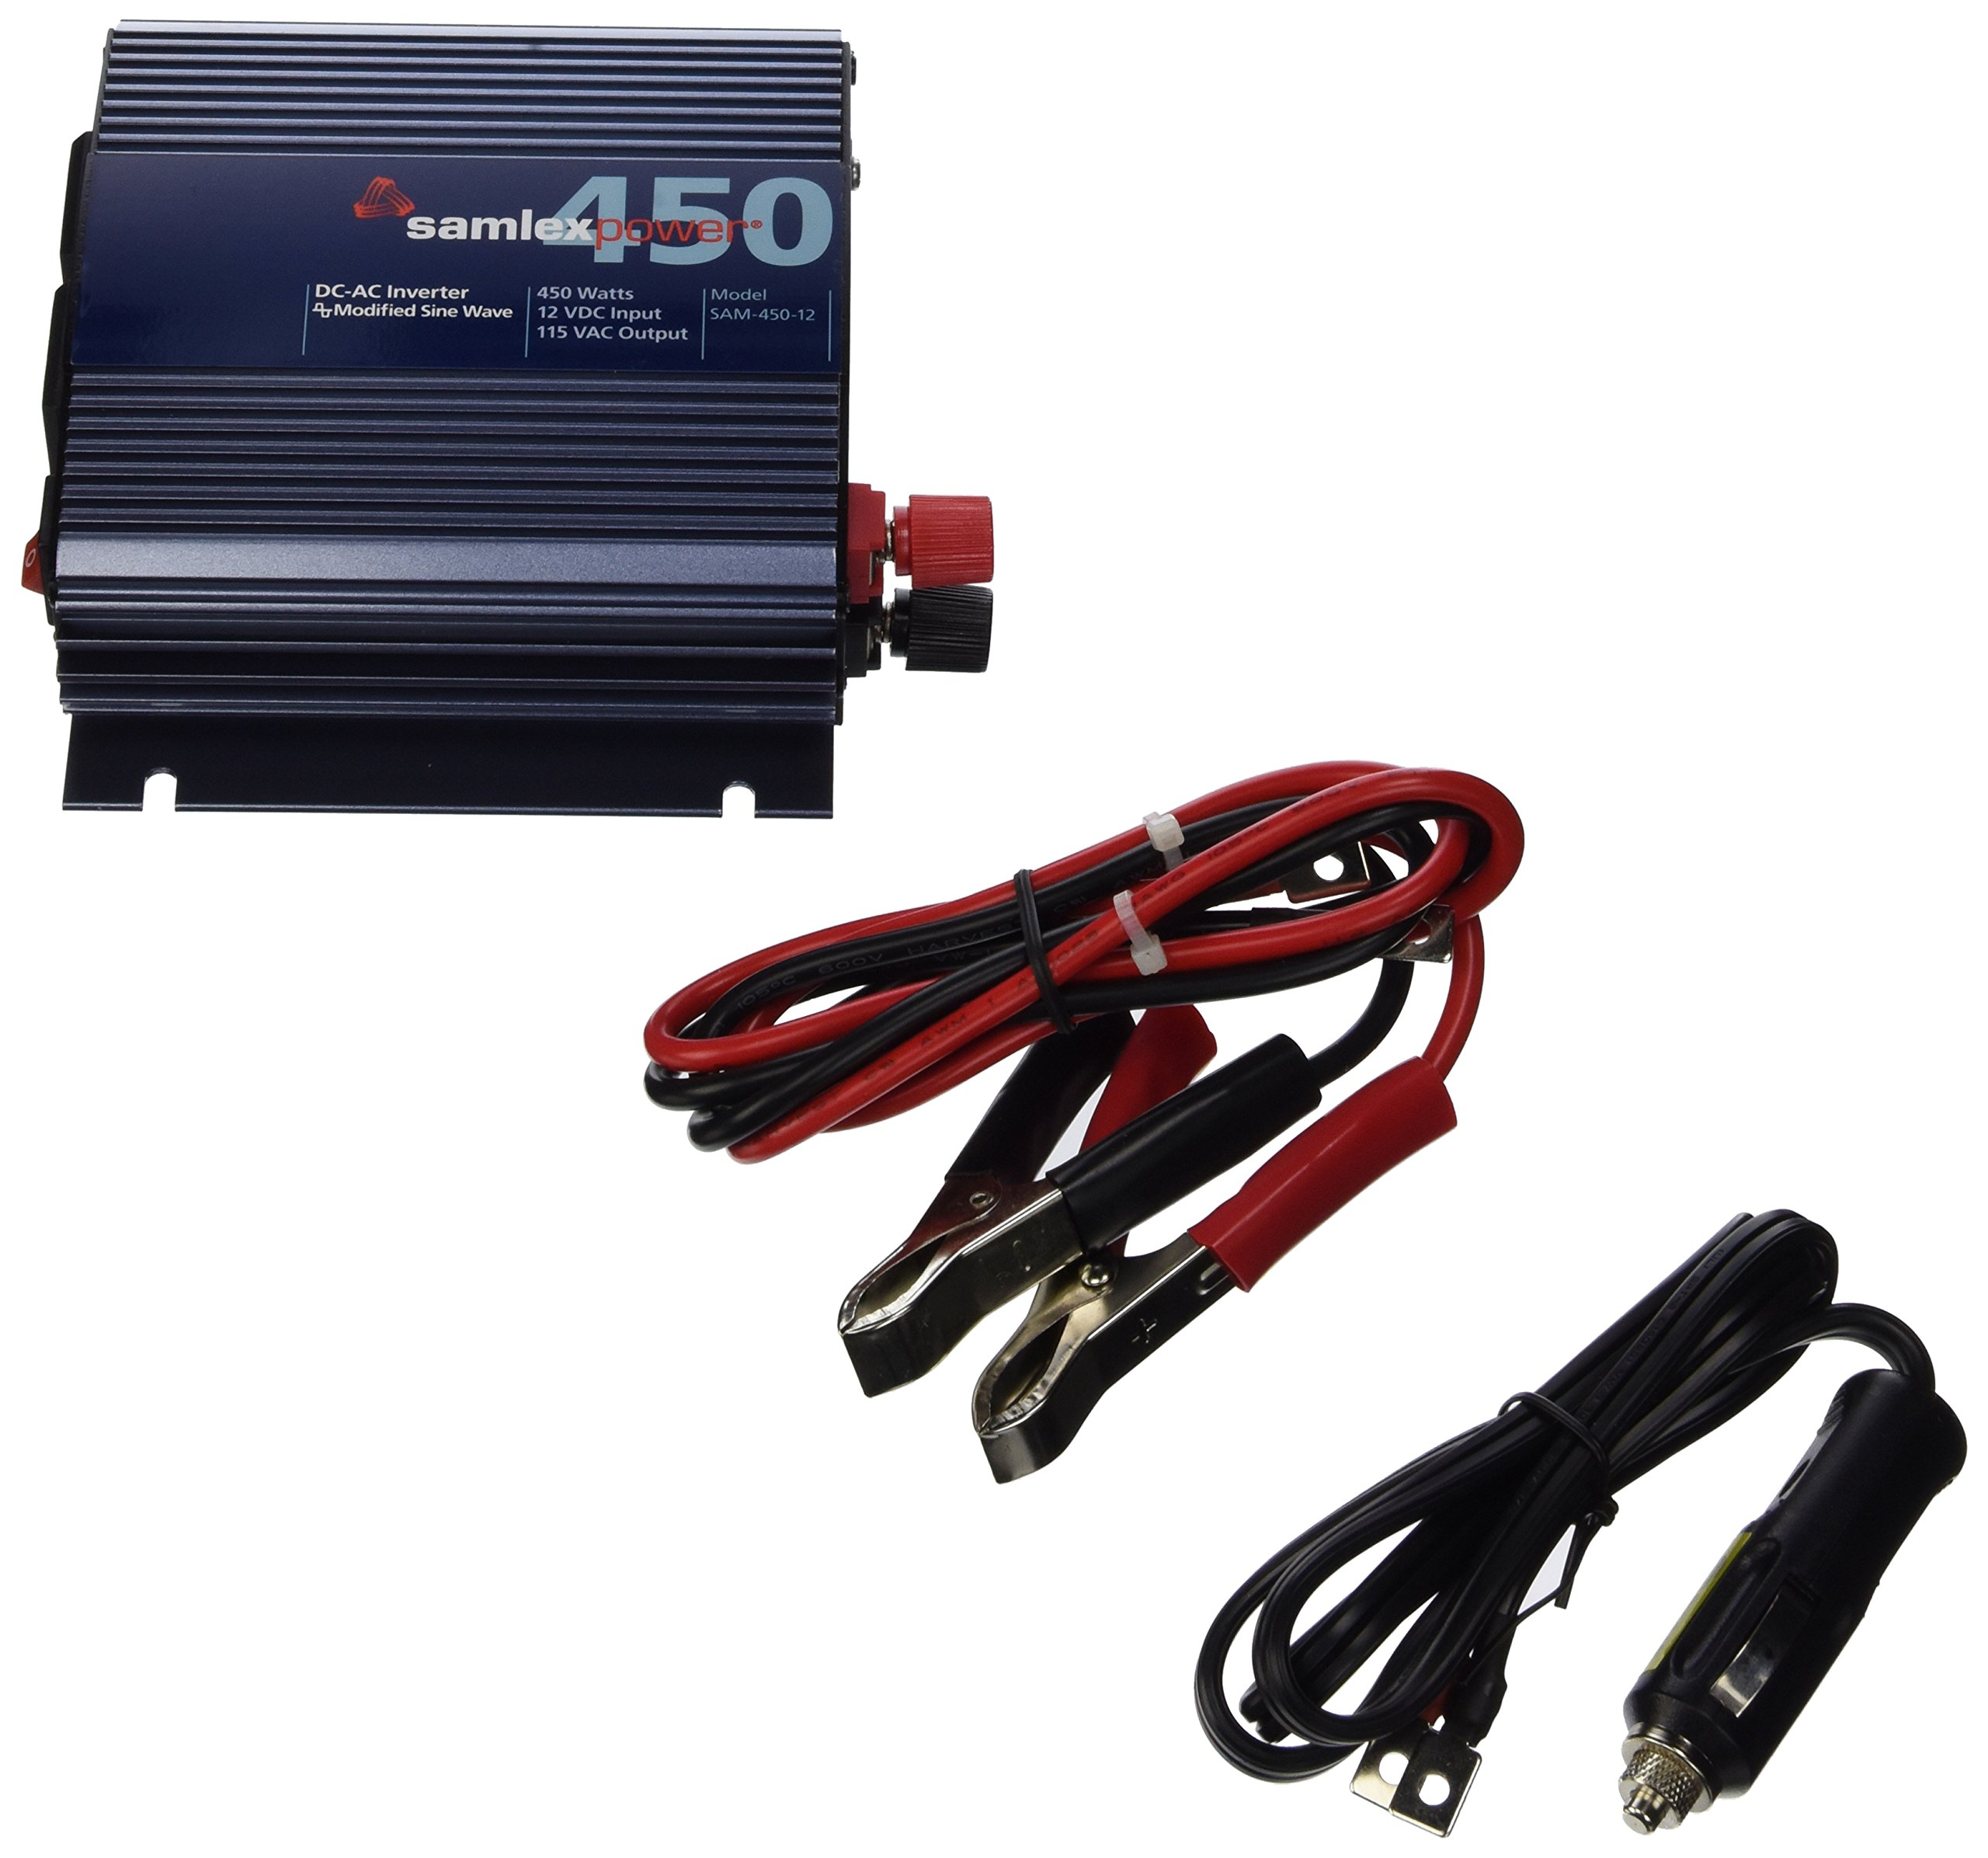 Samlex Solar SAM-450-12 SAM Series Modified Sine Wave Inverter